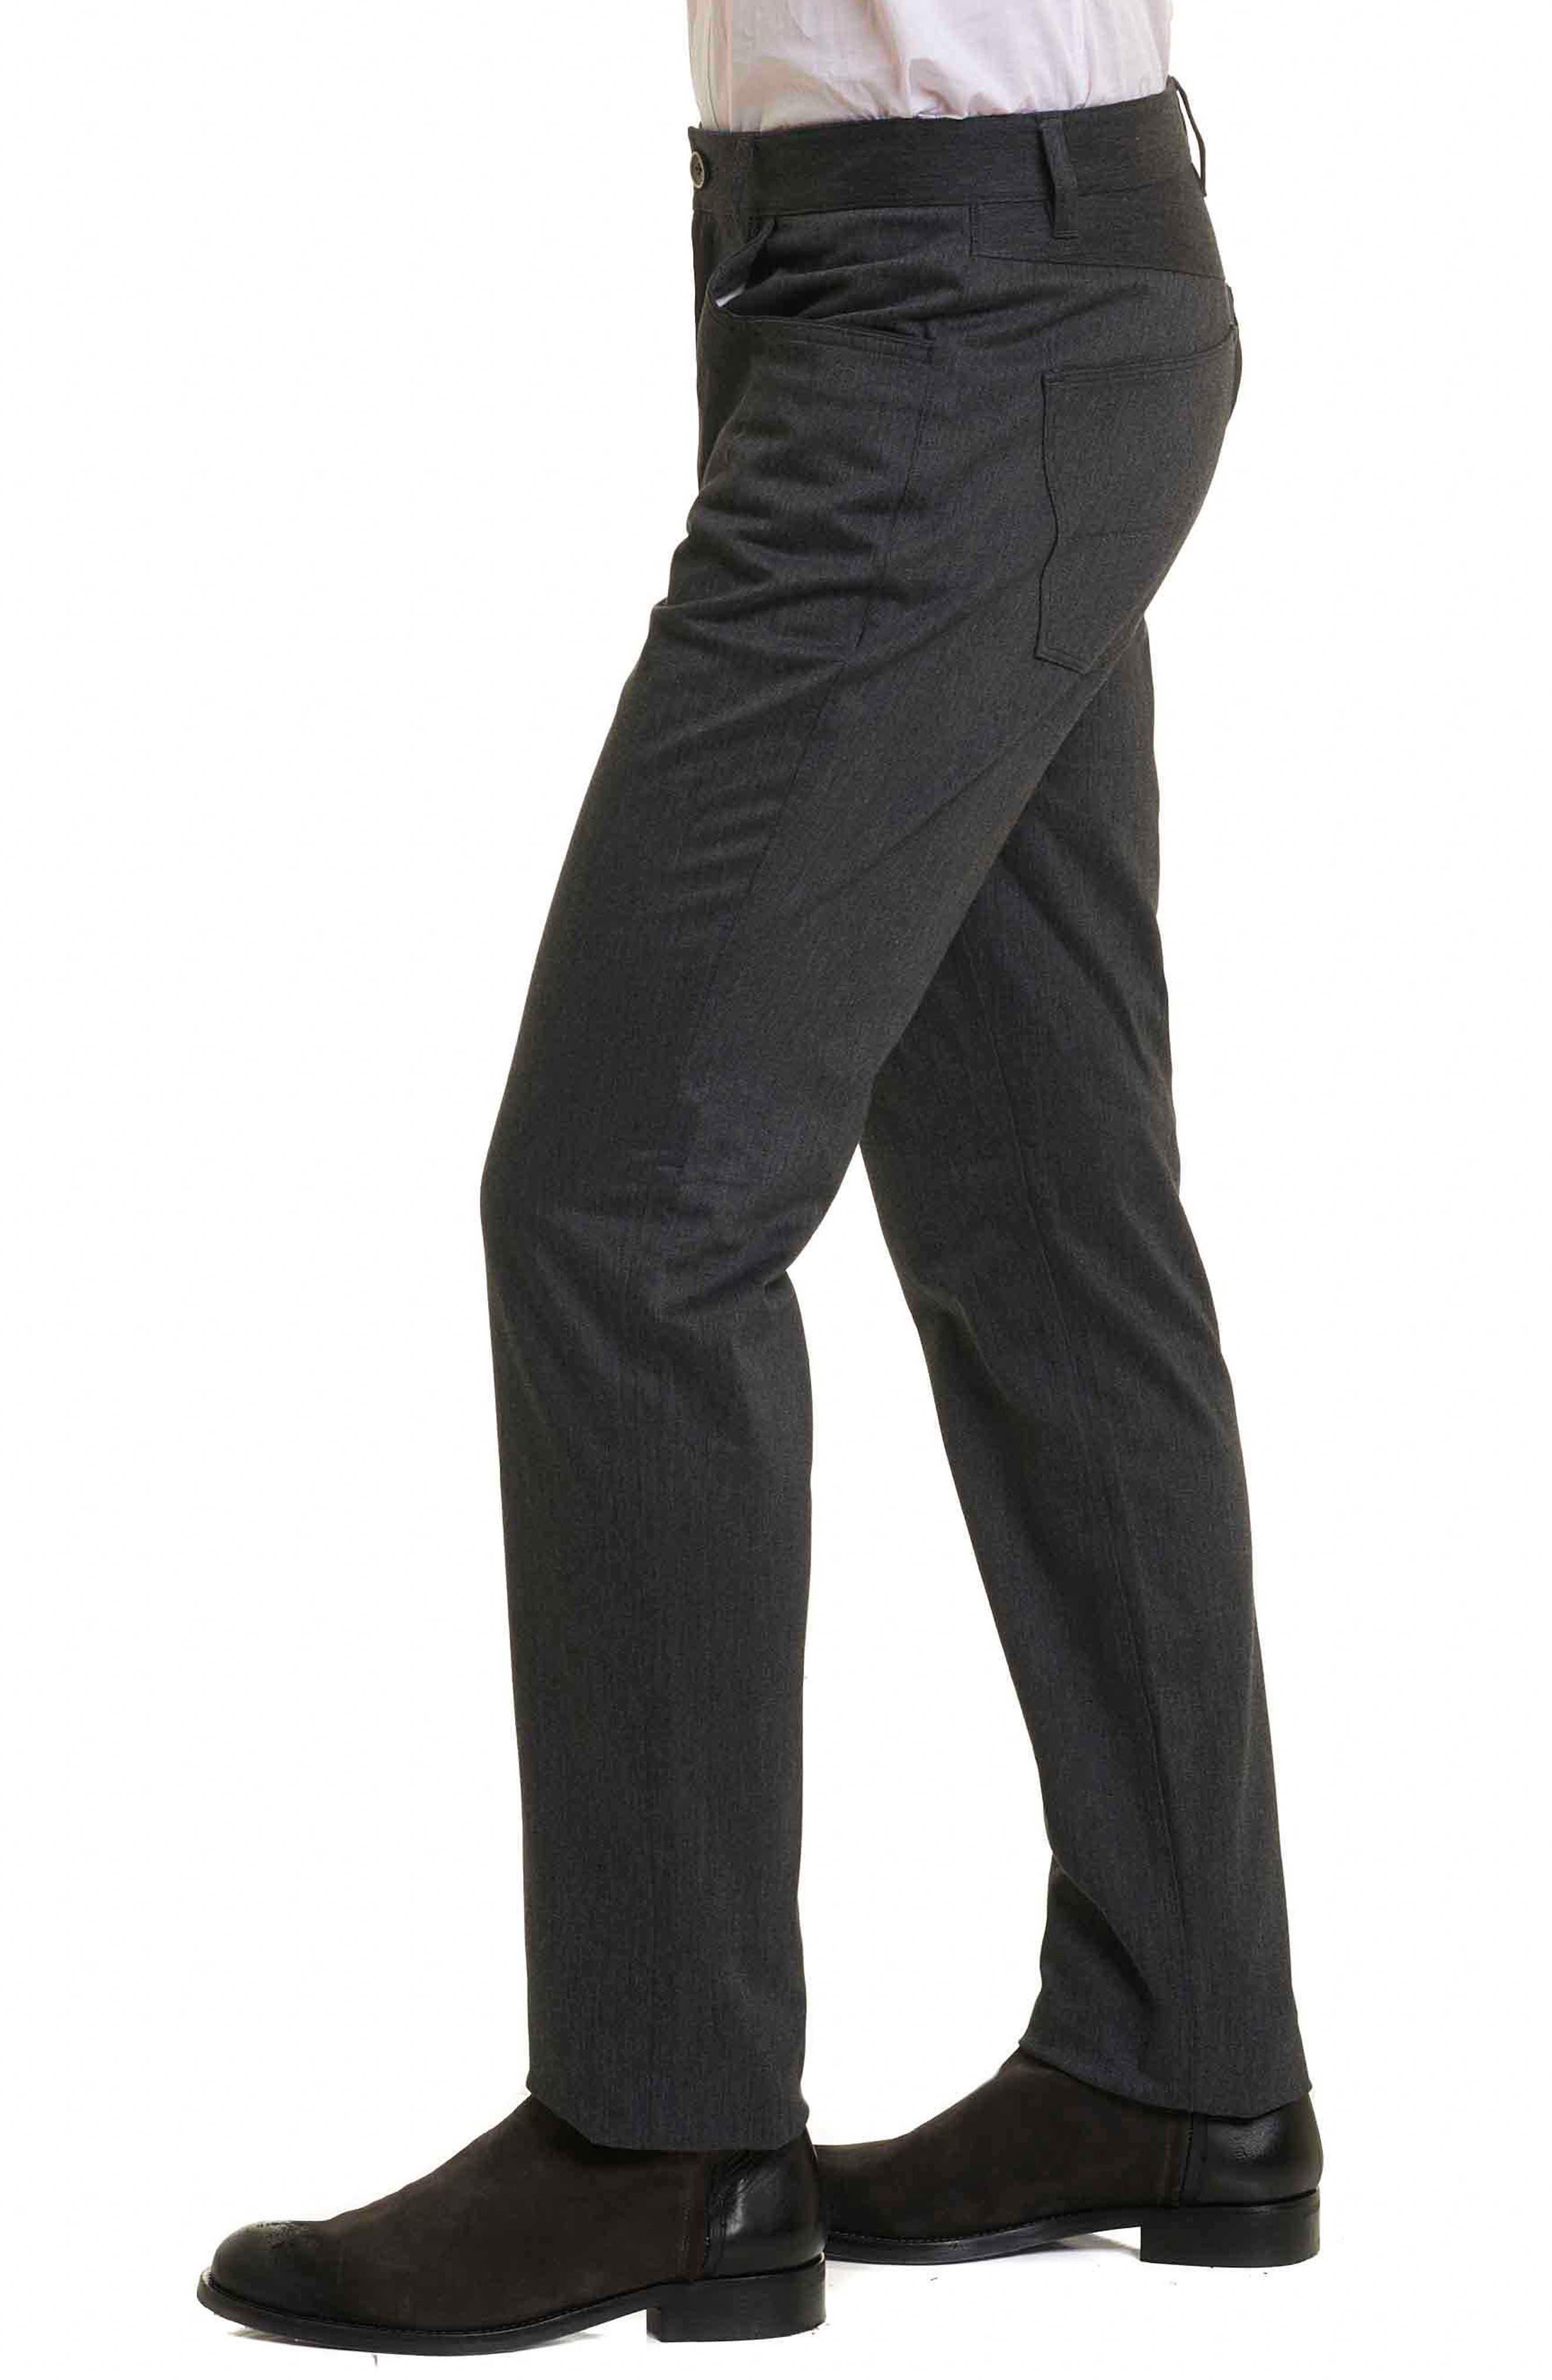 Tanner Five-Pocket Pants,                             Main thumbnail 1, color,                             050